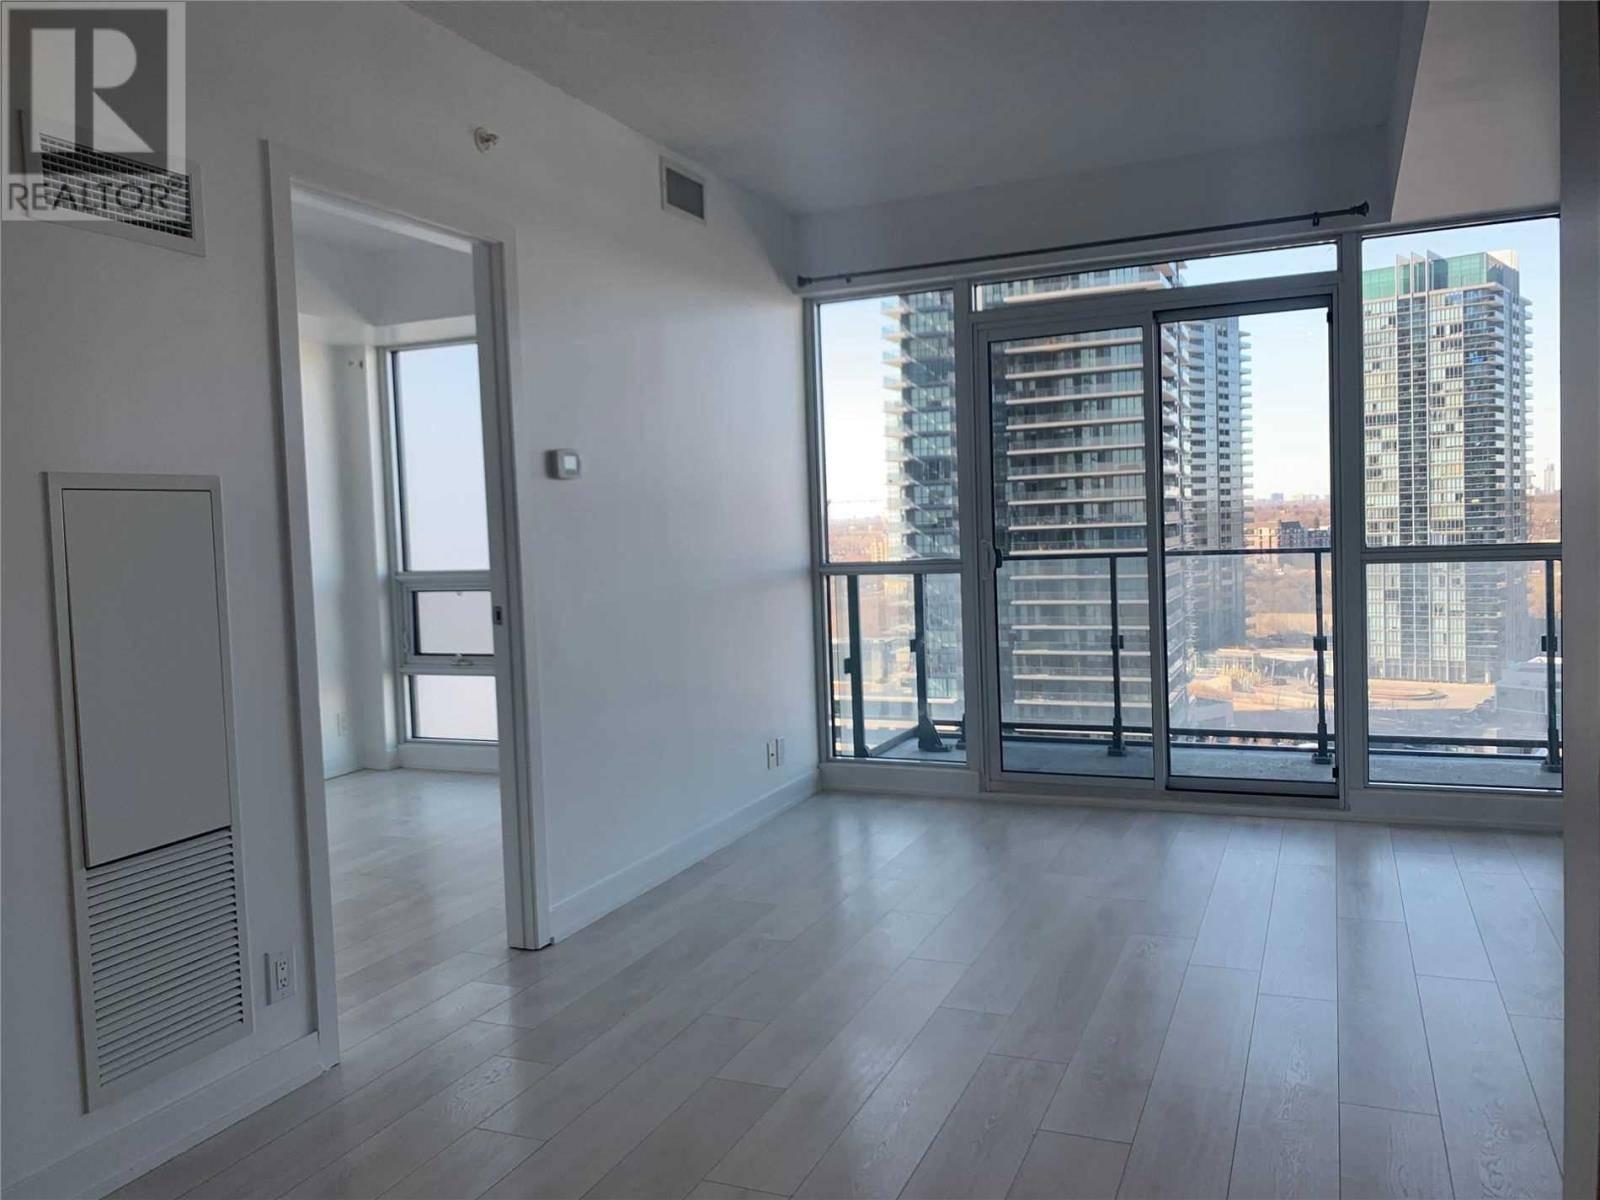 Apartment for rent at 2200 Lakeshore Blvd West Unit 1805 Toronto Ontario - MLS: W4699142